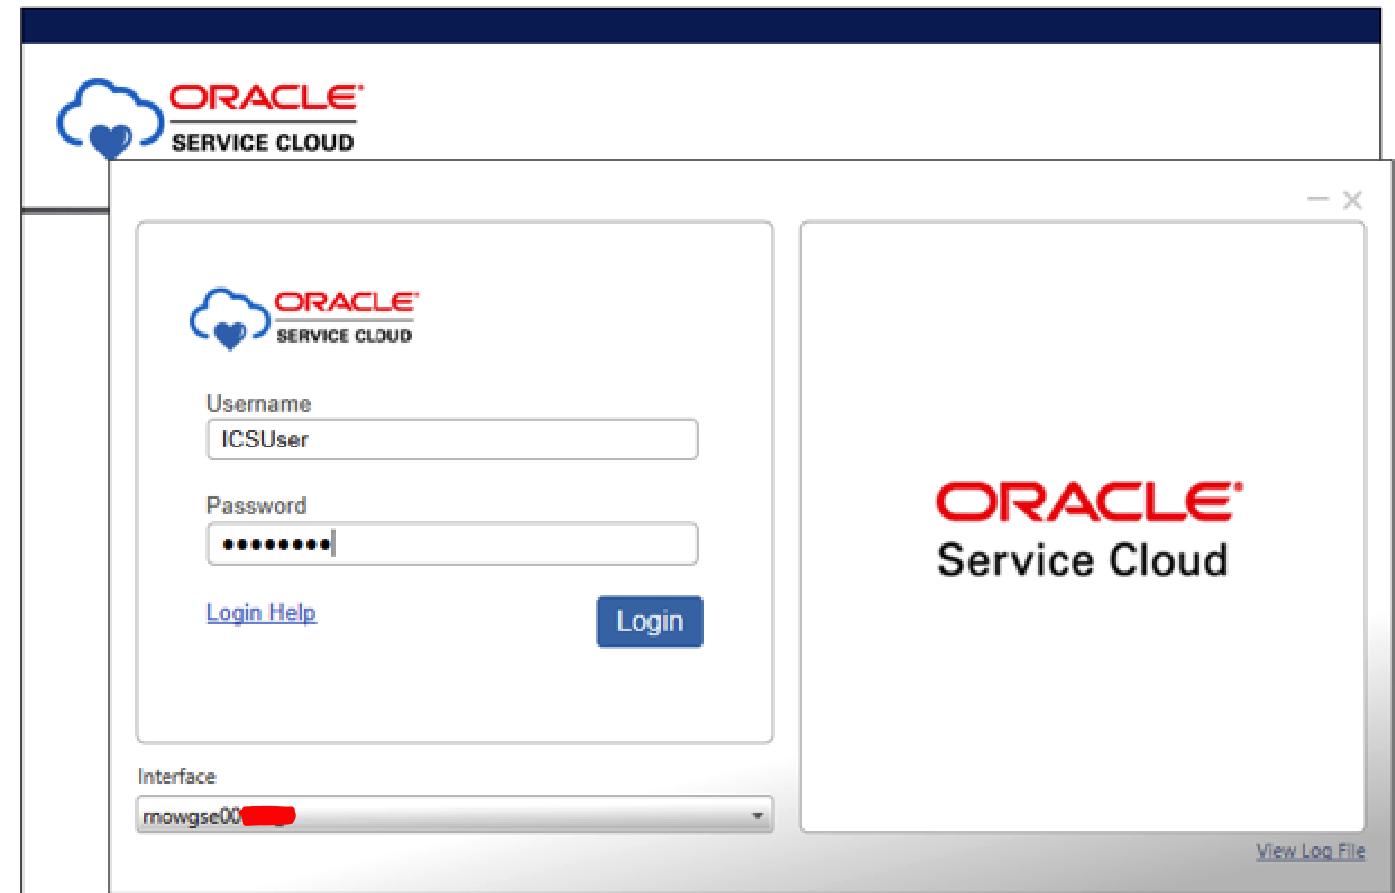 Oracle Service Cloud to Eloqua Contact Create/Update using